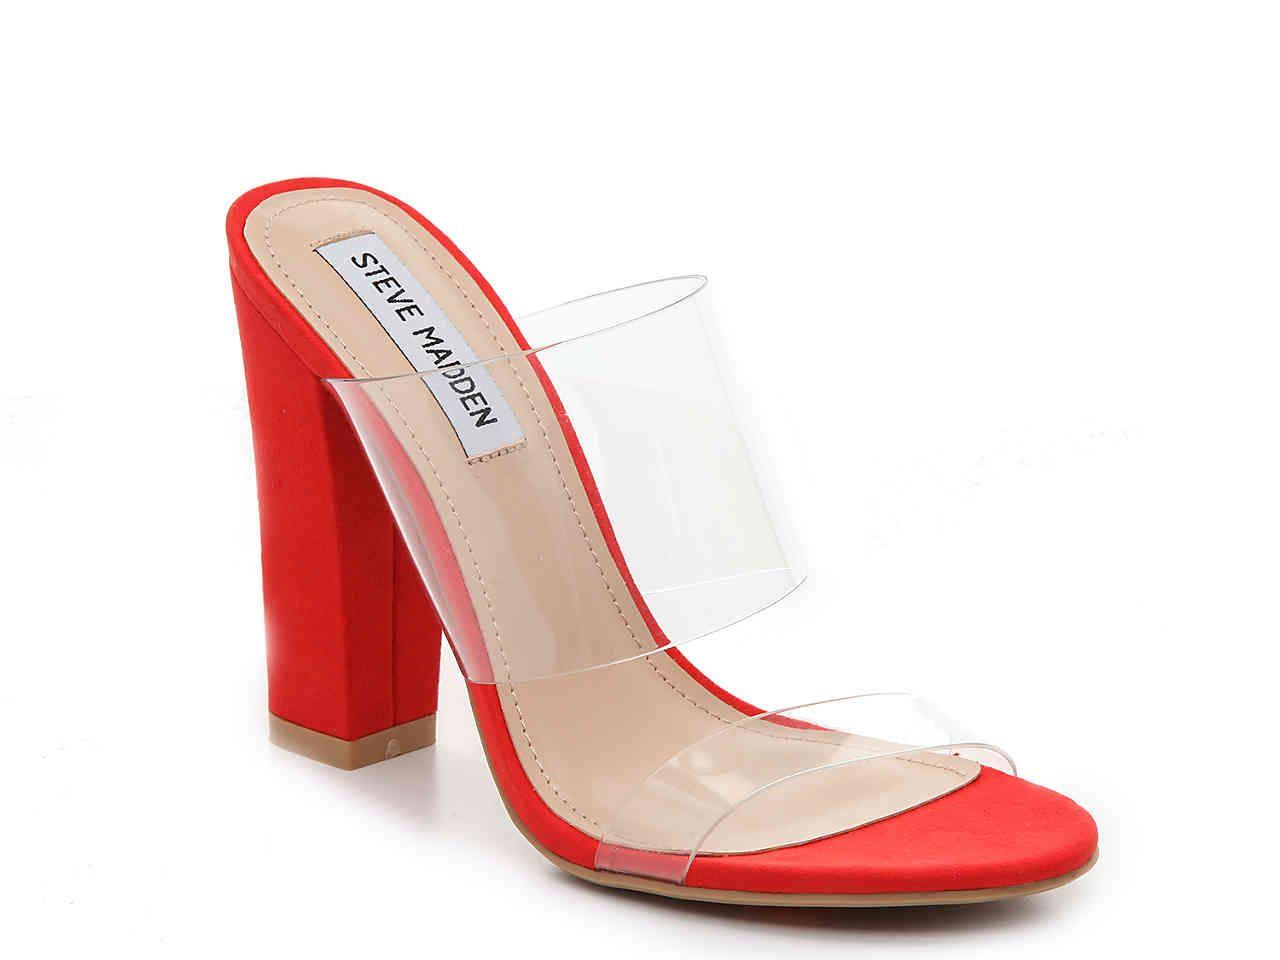 Steve Madden Jubilee Sandal   Womens red shoes, Work shoes women ...